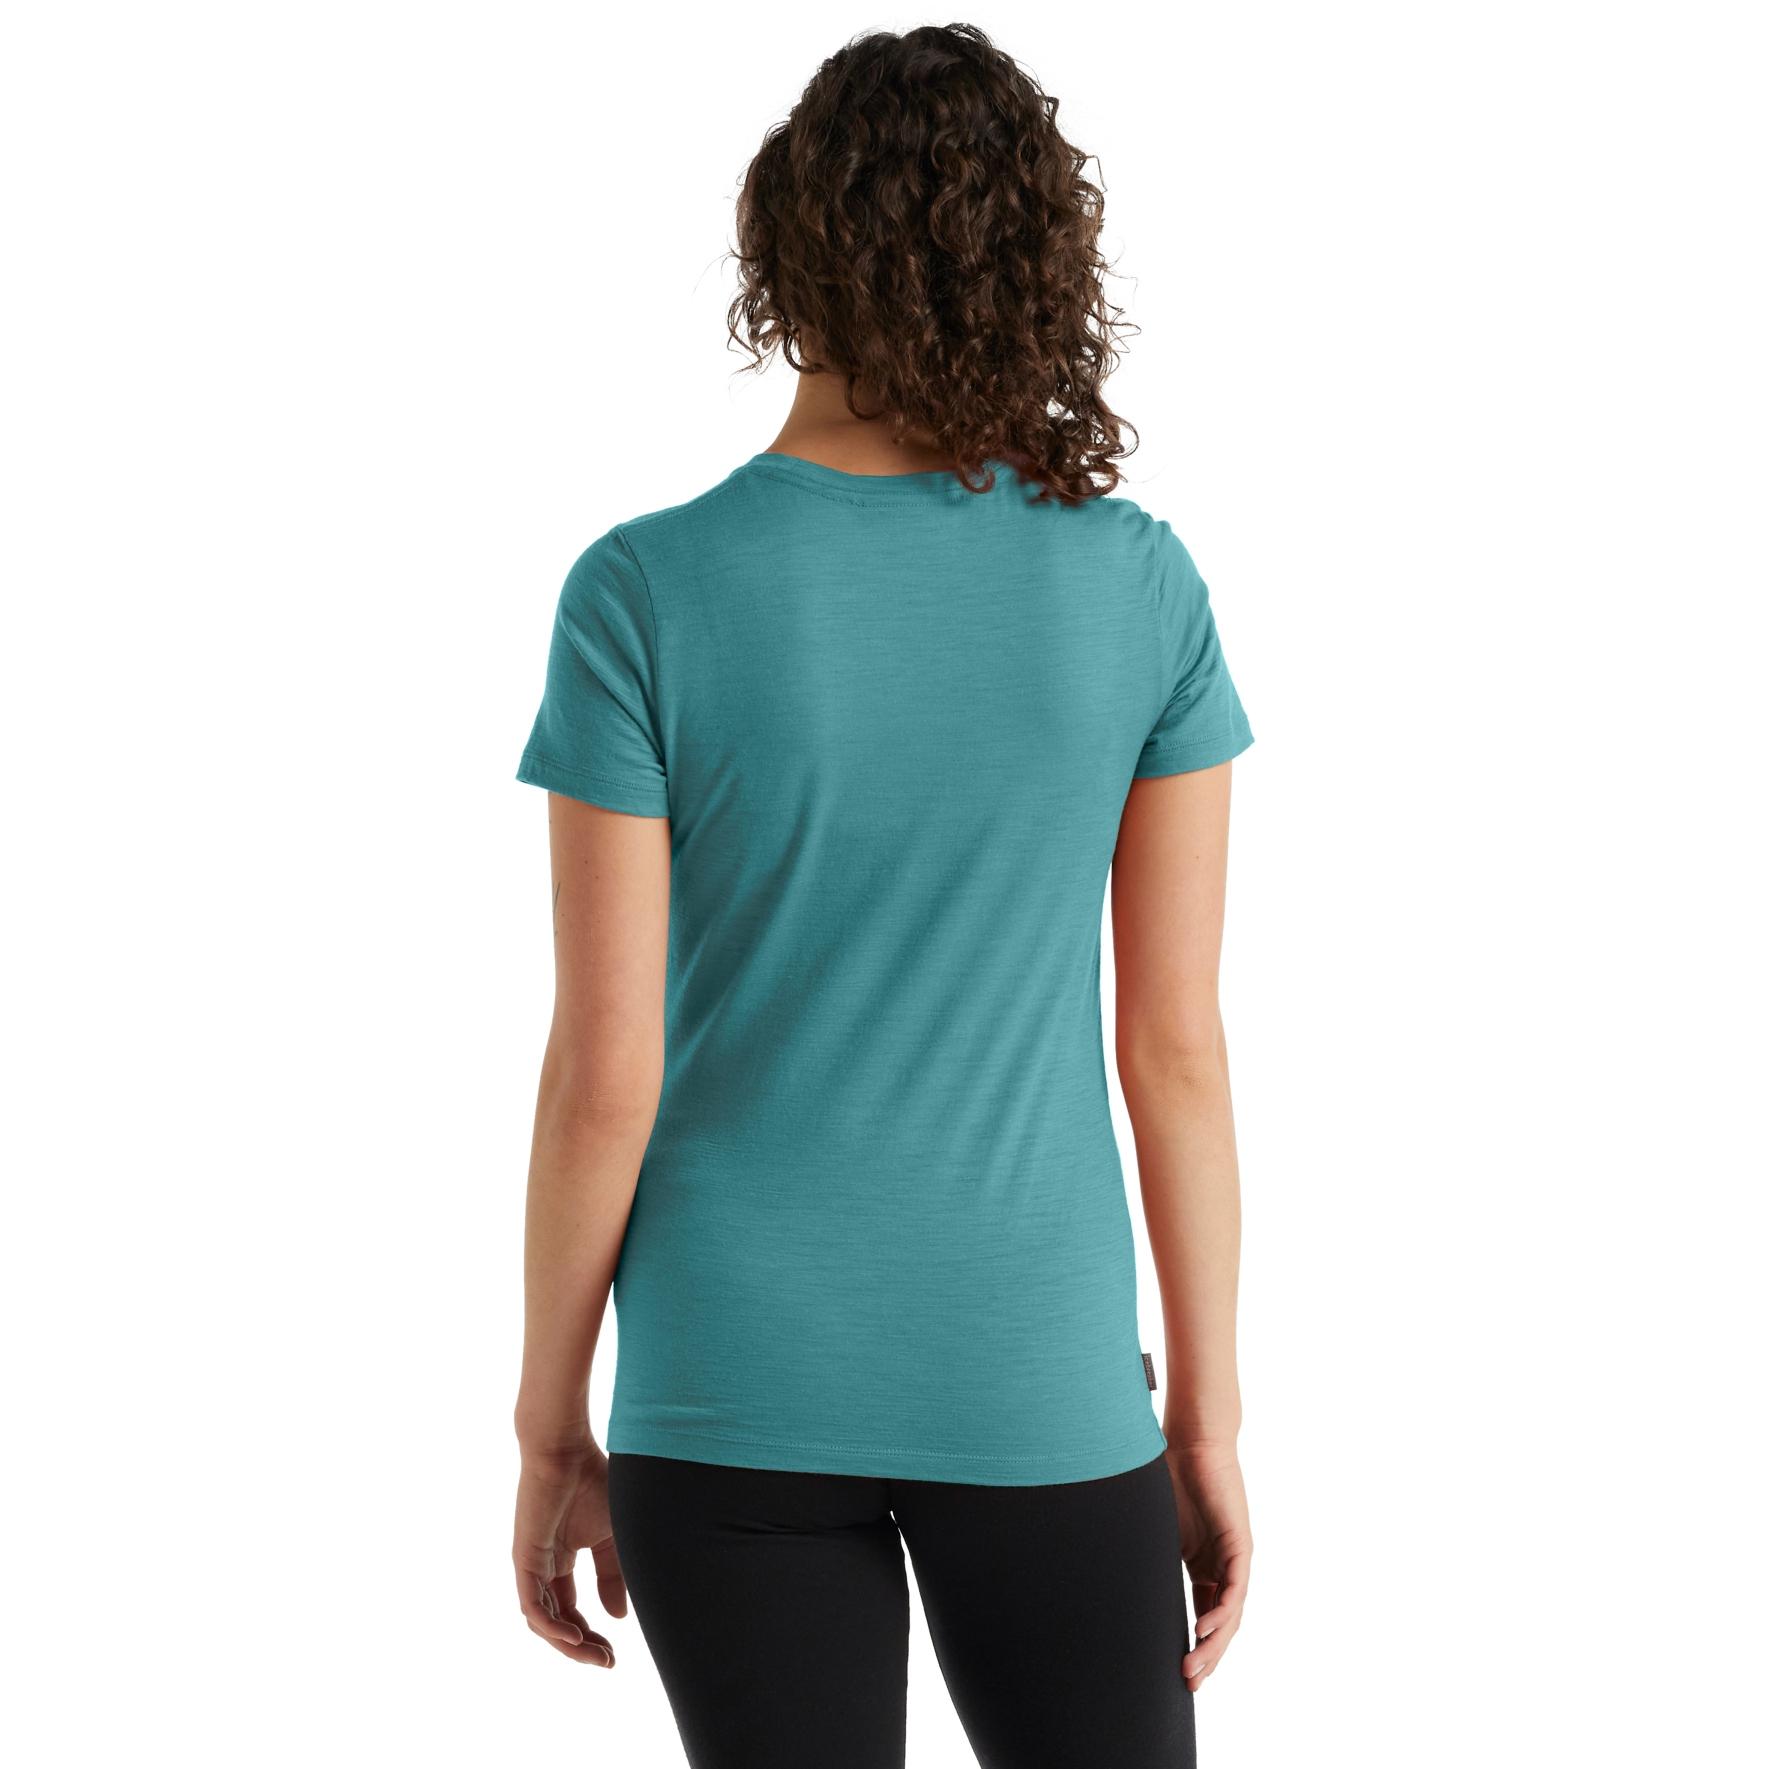 Bild von Icebreaker Tech Lite II Single Line Ski Damen T-Shirt - Arctic Teal